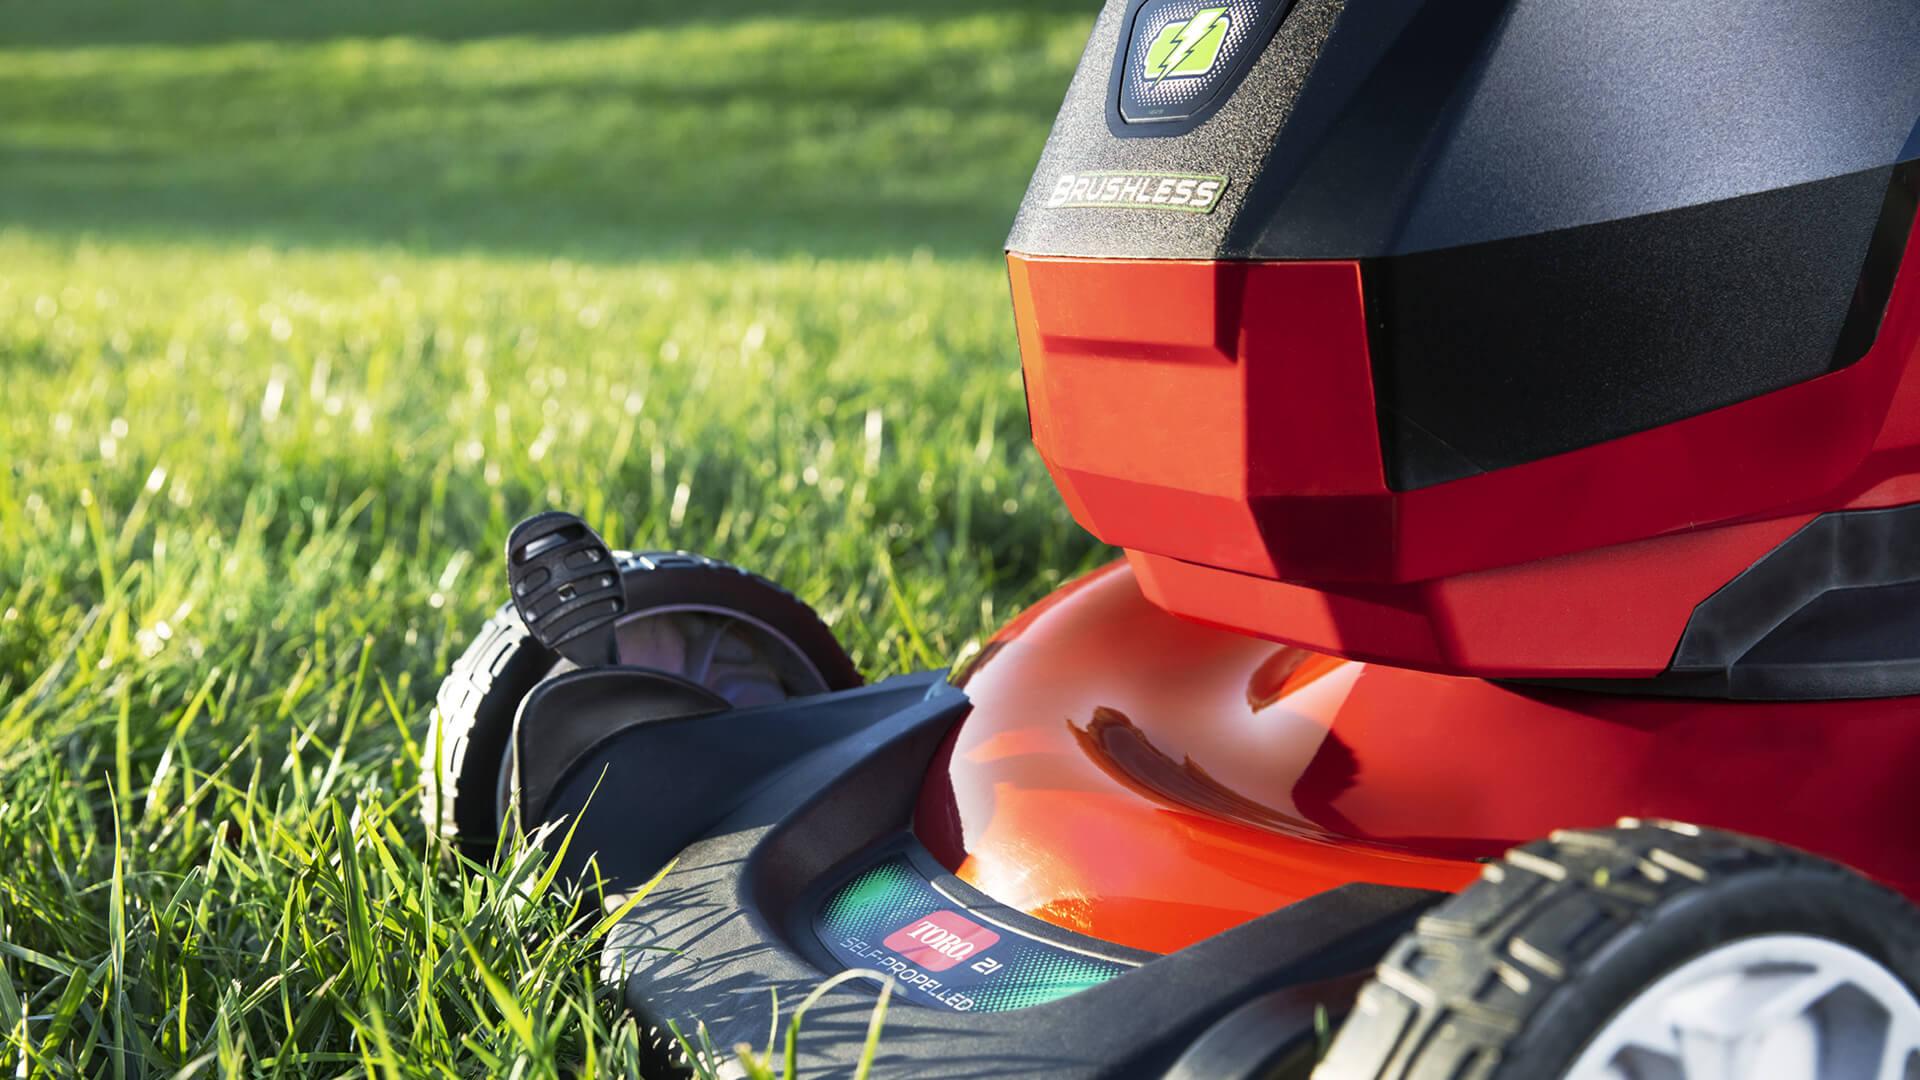 mower in grass